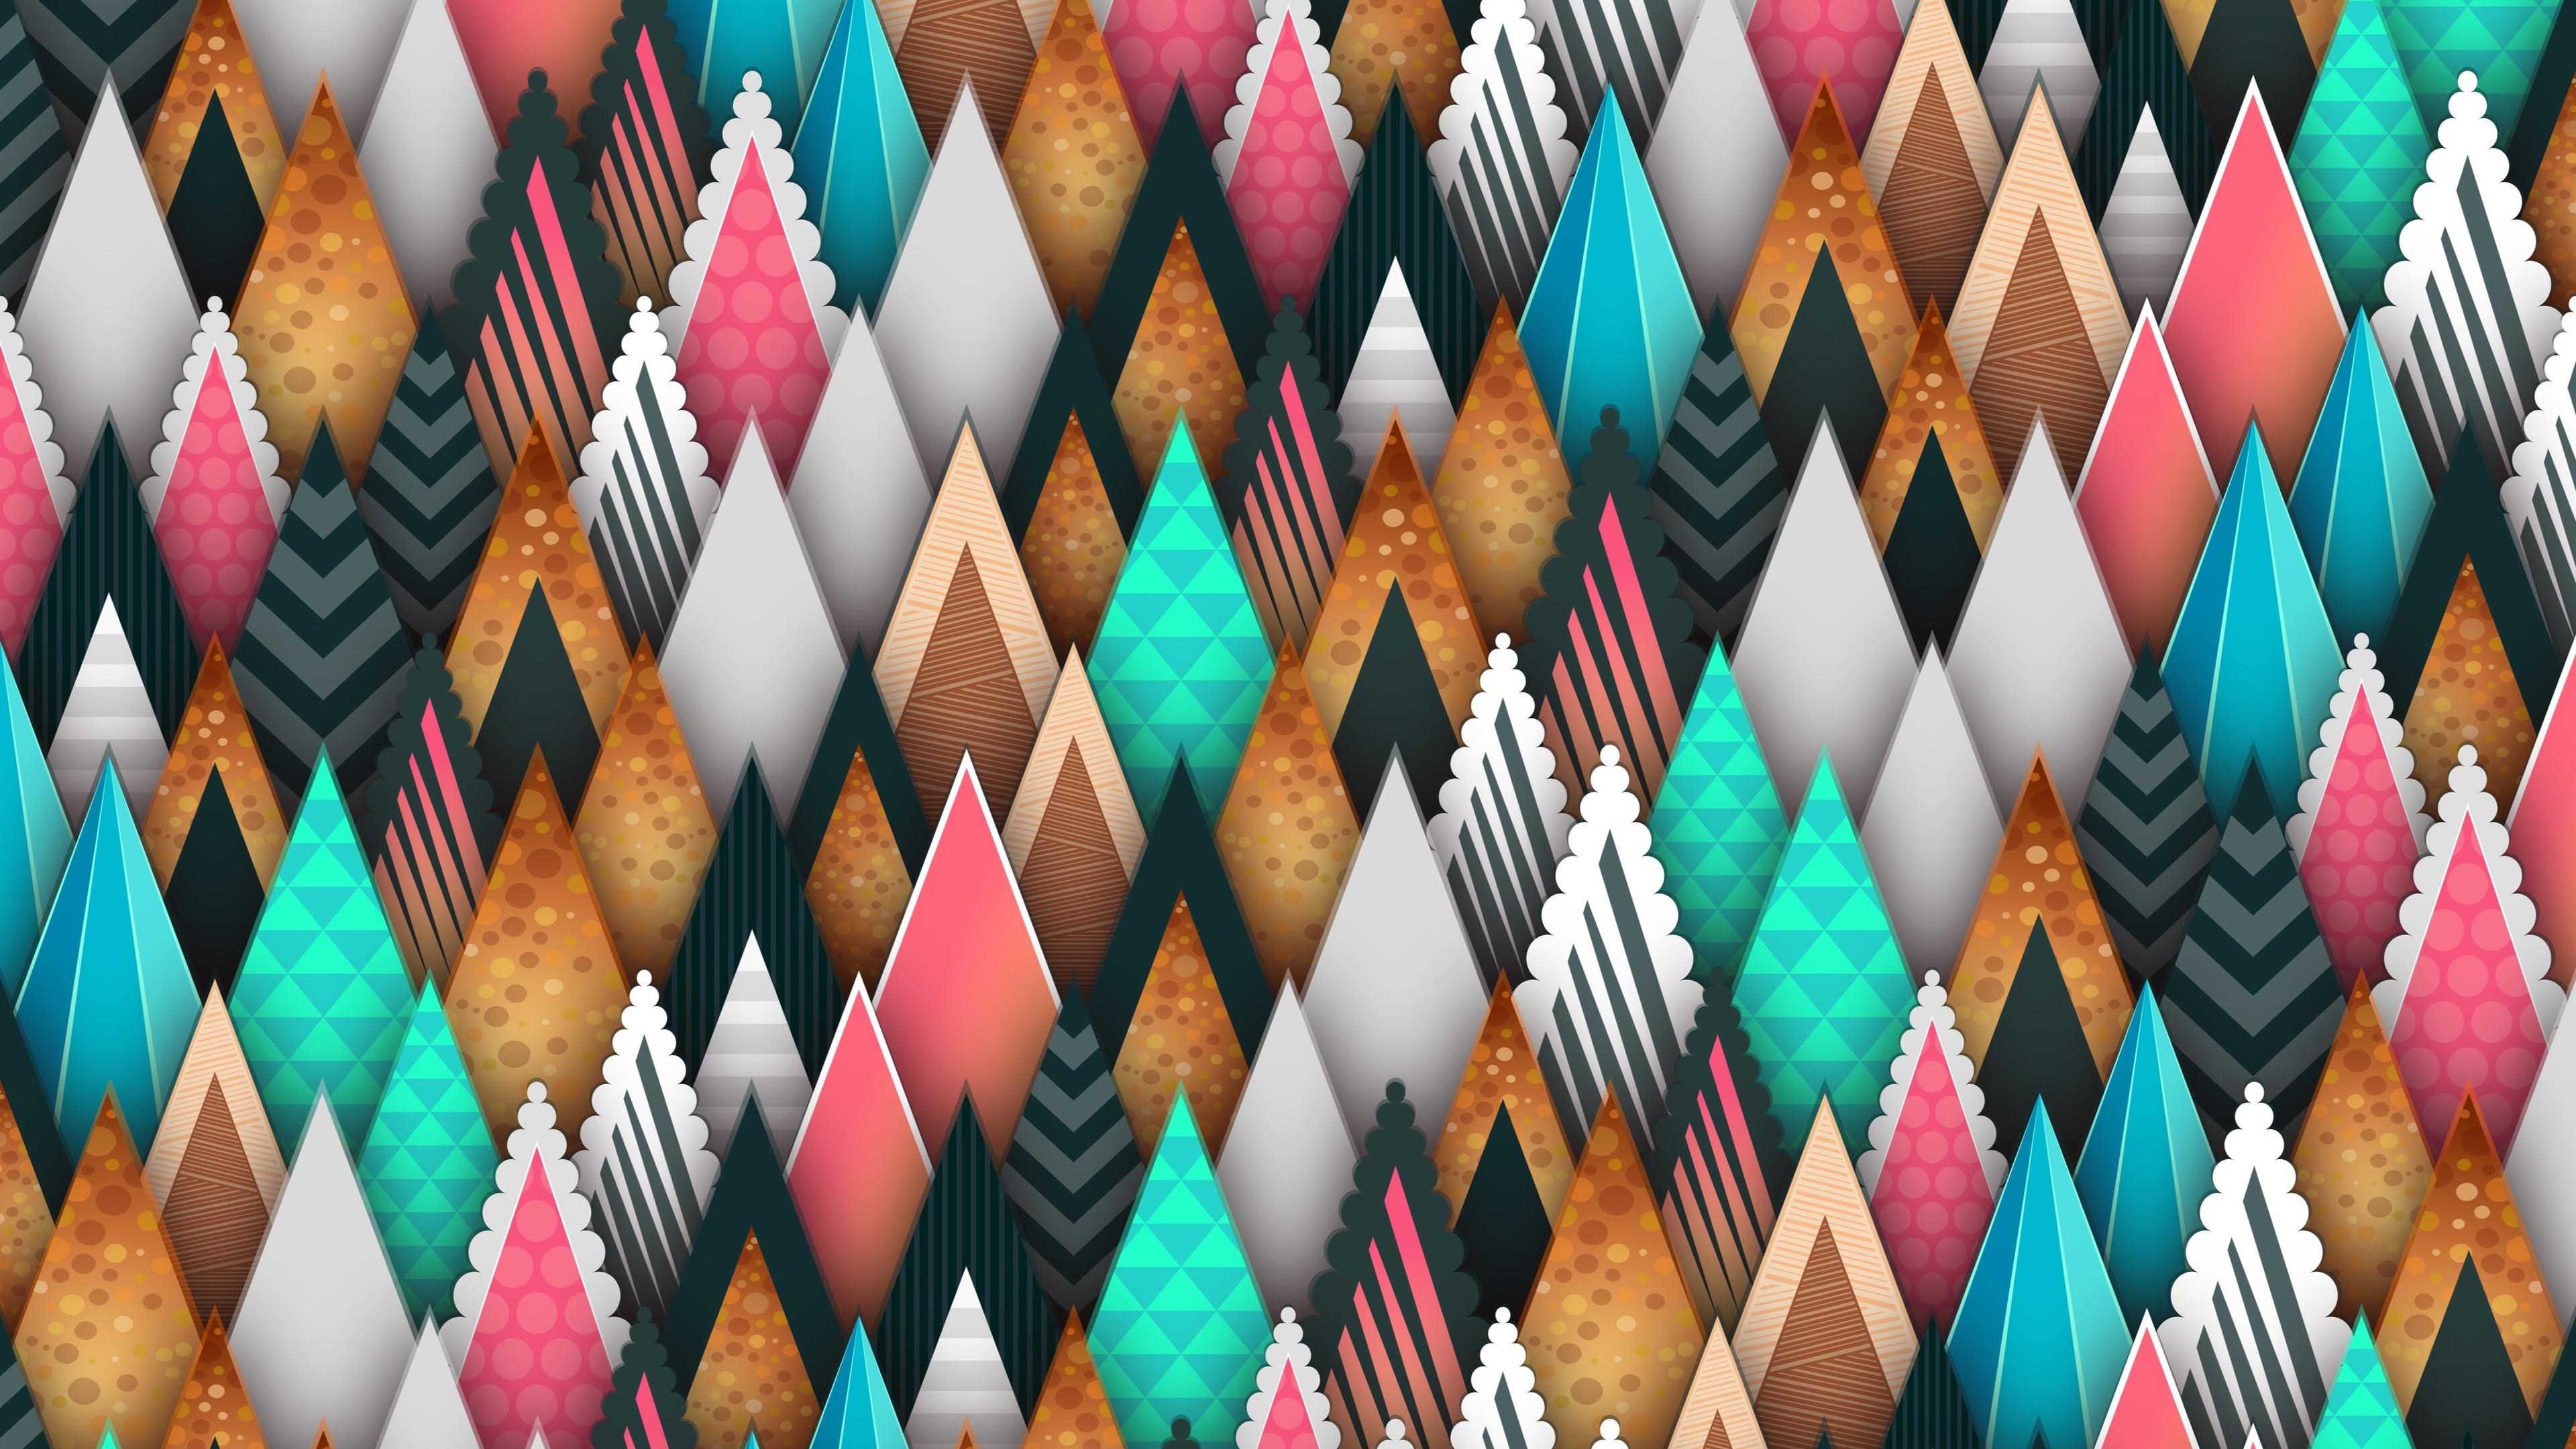 abstract sharp shapes 5k 1539371260 - Abstract Sharp Shapes 5k - shapes wallpapers, hd-wallpapers, colorful wallpapers, abstract wallpapers, 5k wallpapers, 4k-wallpapers